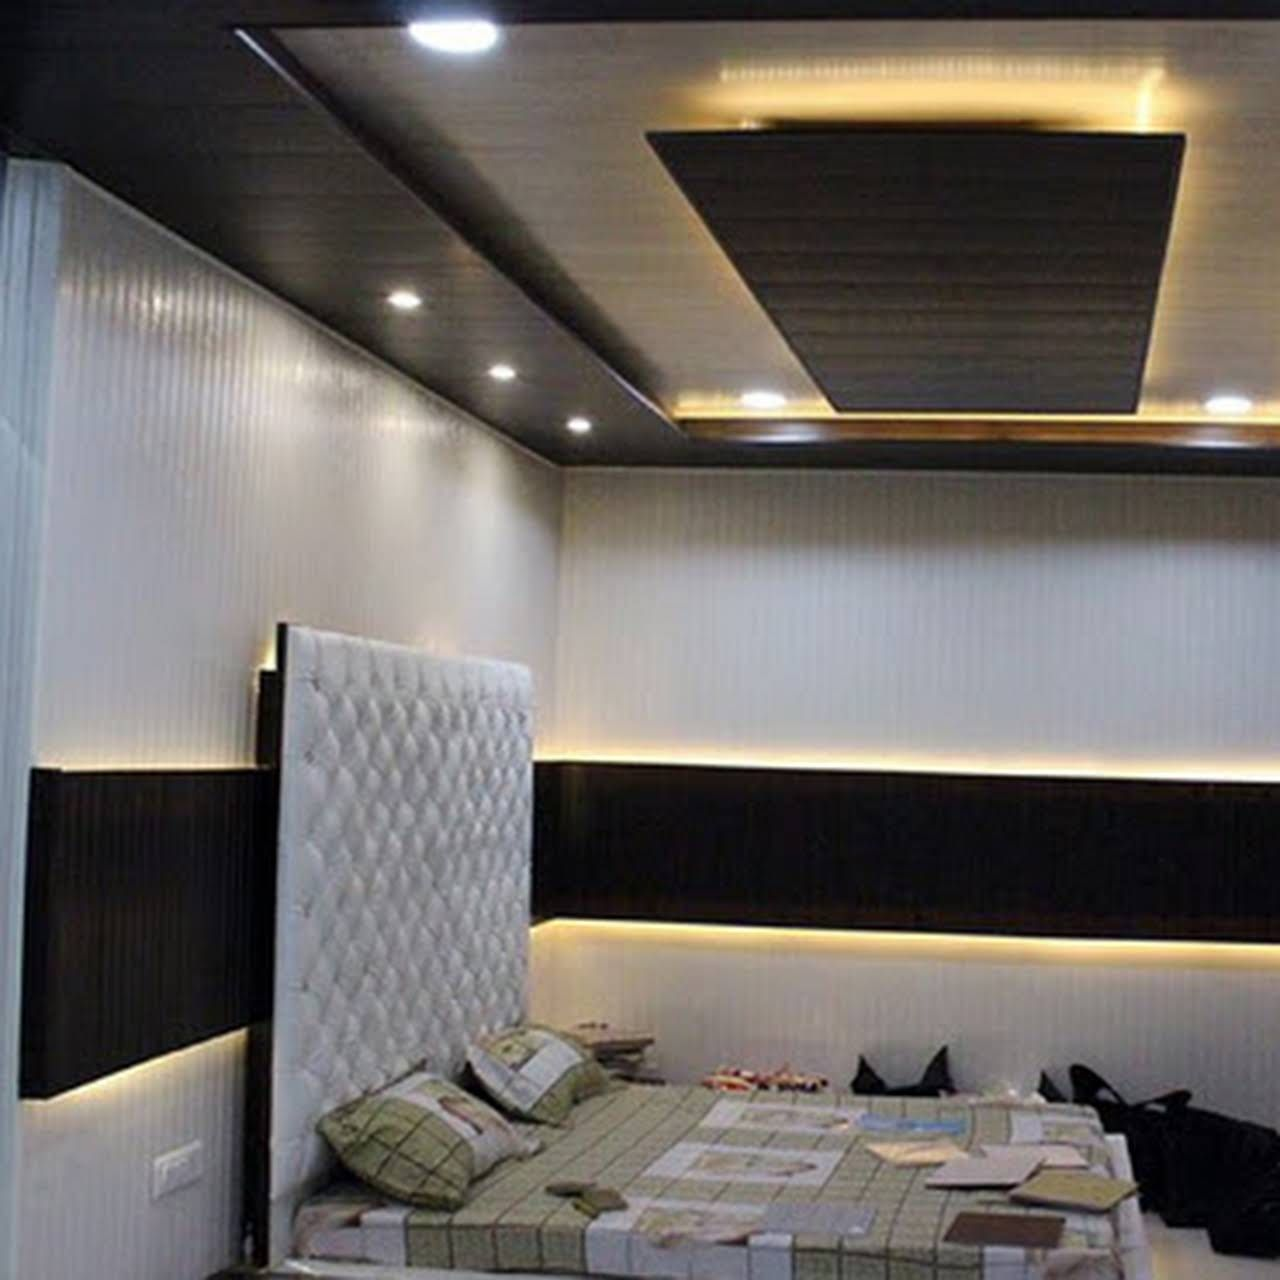 Pin By Yayat Jay On Pvc Ceiling Pvc Ceiling Design Ceiling Design Ceiling Design Bedroom Popular bedroom pvc ceiling